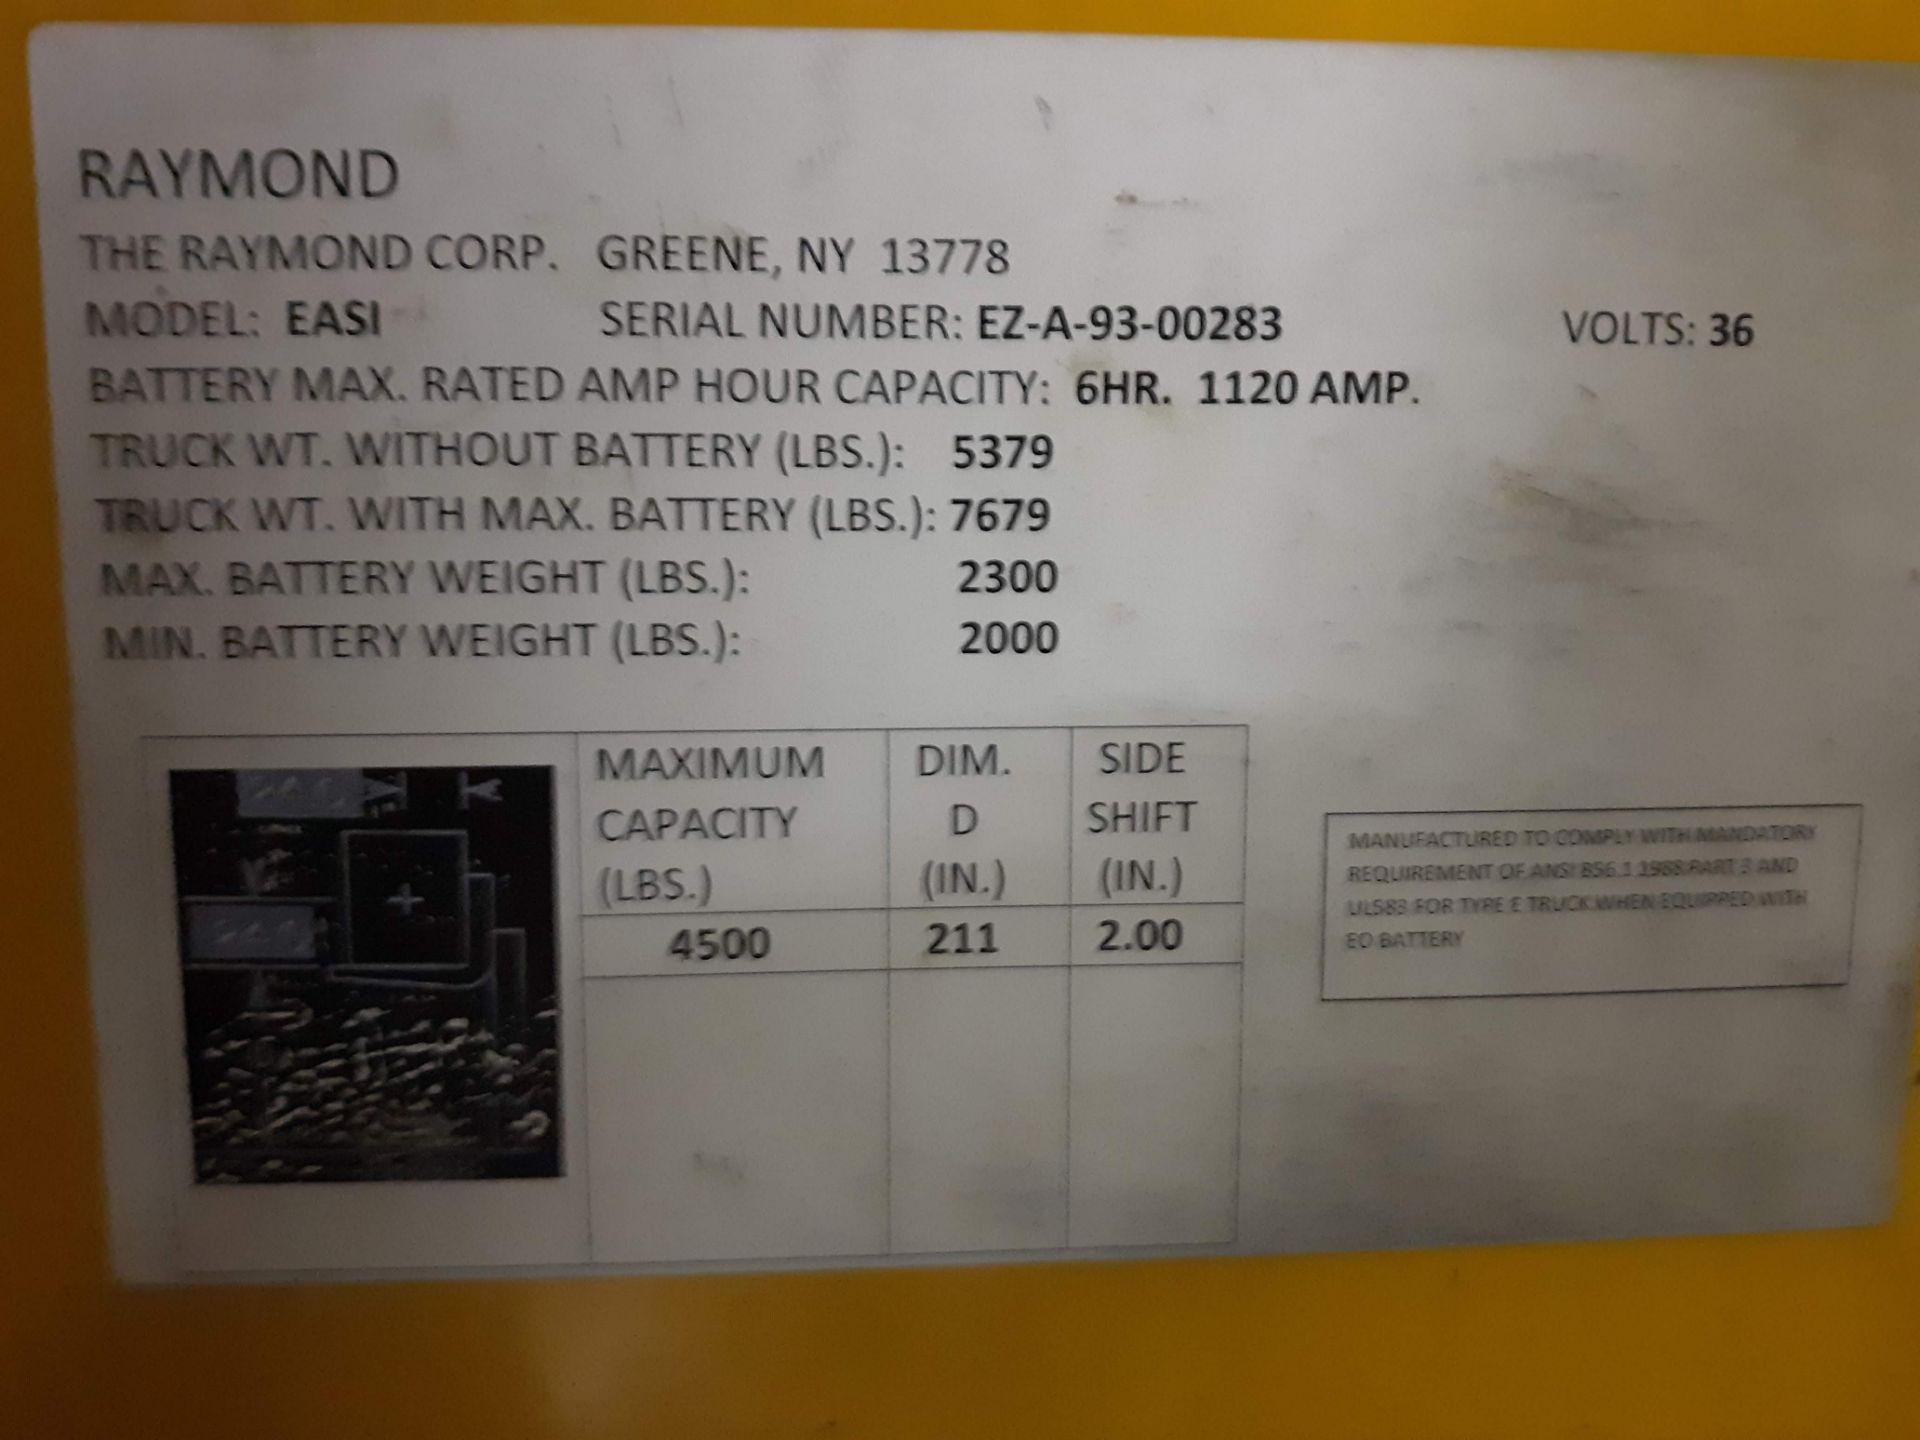 Lot 1206 - RAYMOND STAND UP FORK TRUCK (NEEDS BATTERY) MODEL-EASI S#EZA-93-00283 36VOLT 4,500 LB. CAPACITY (